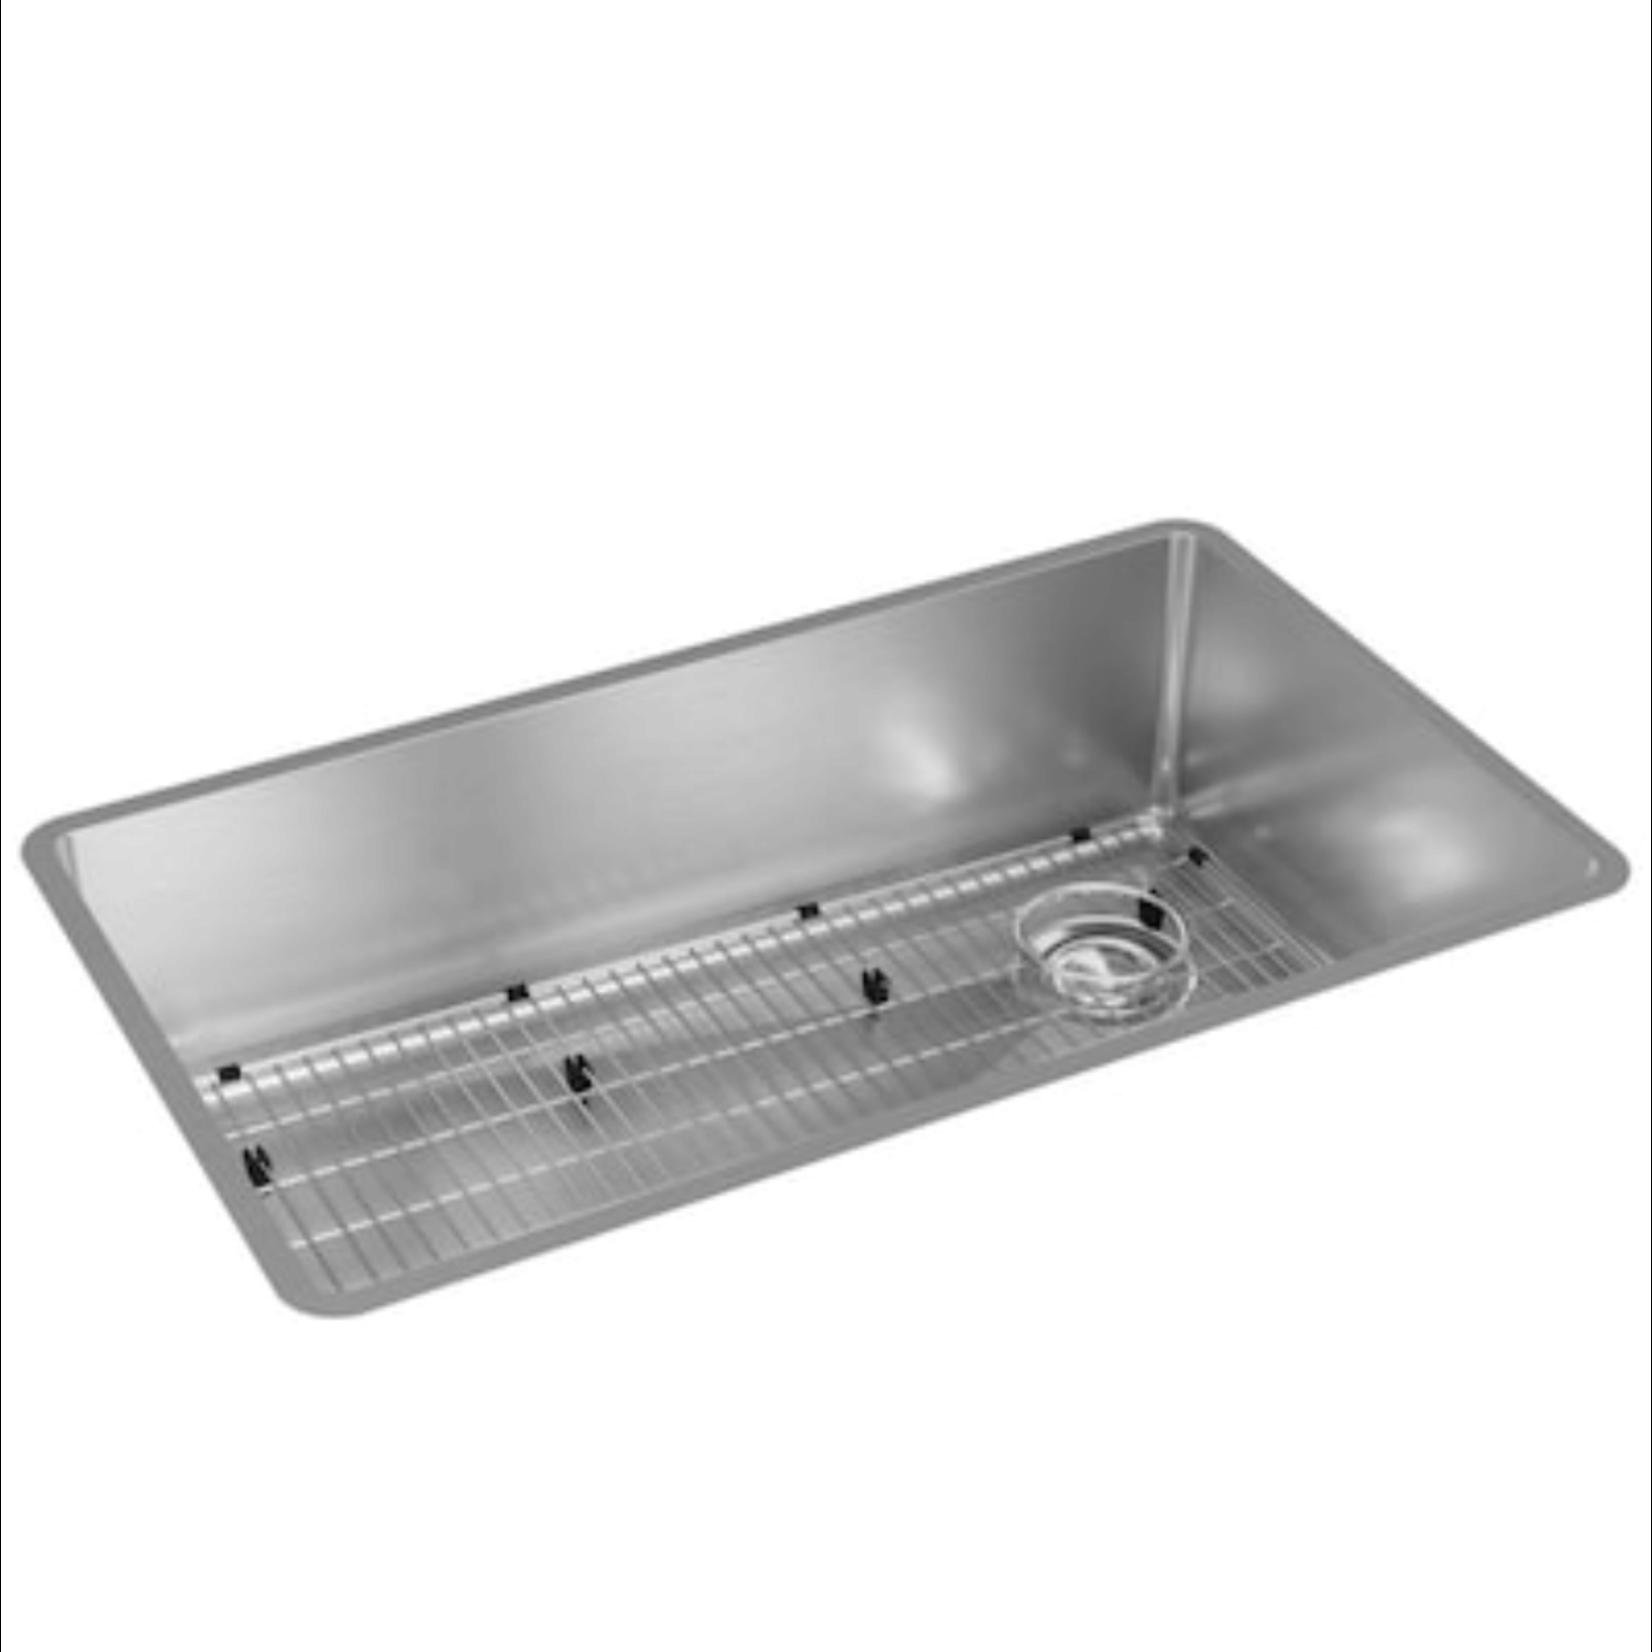 10092 Elkay Crosstown Stainless Steel Kitchen Sink